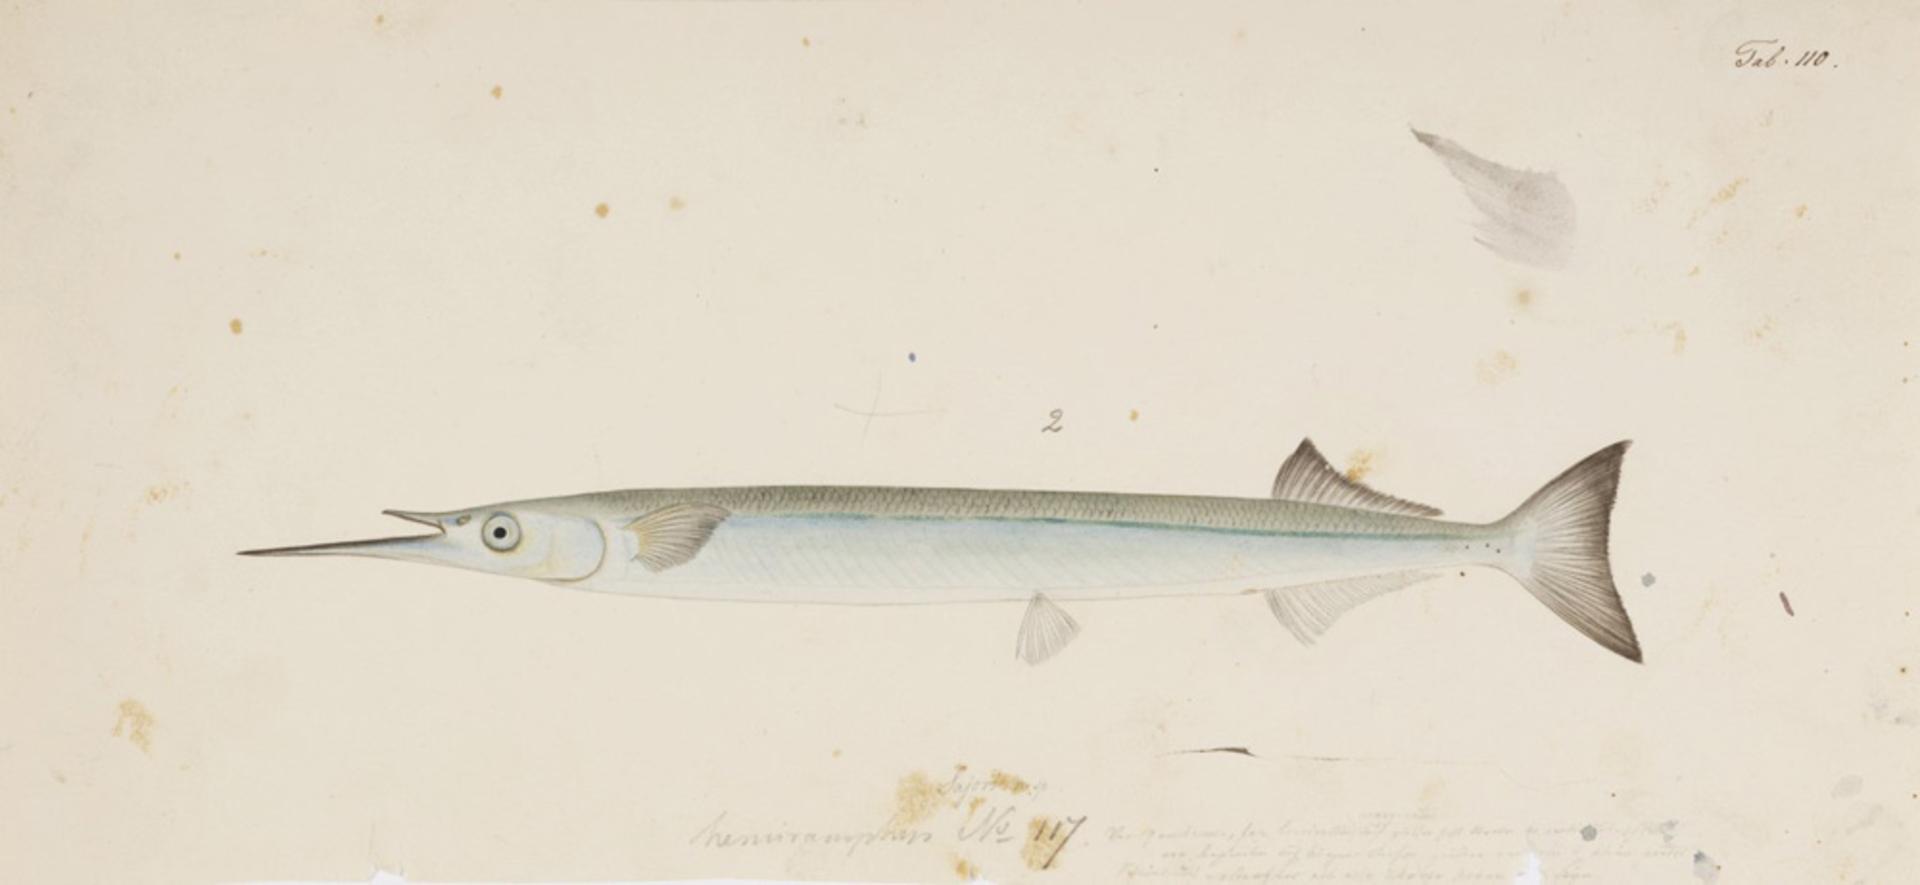 RMNH.ART.154 | Hyporhampus sajori